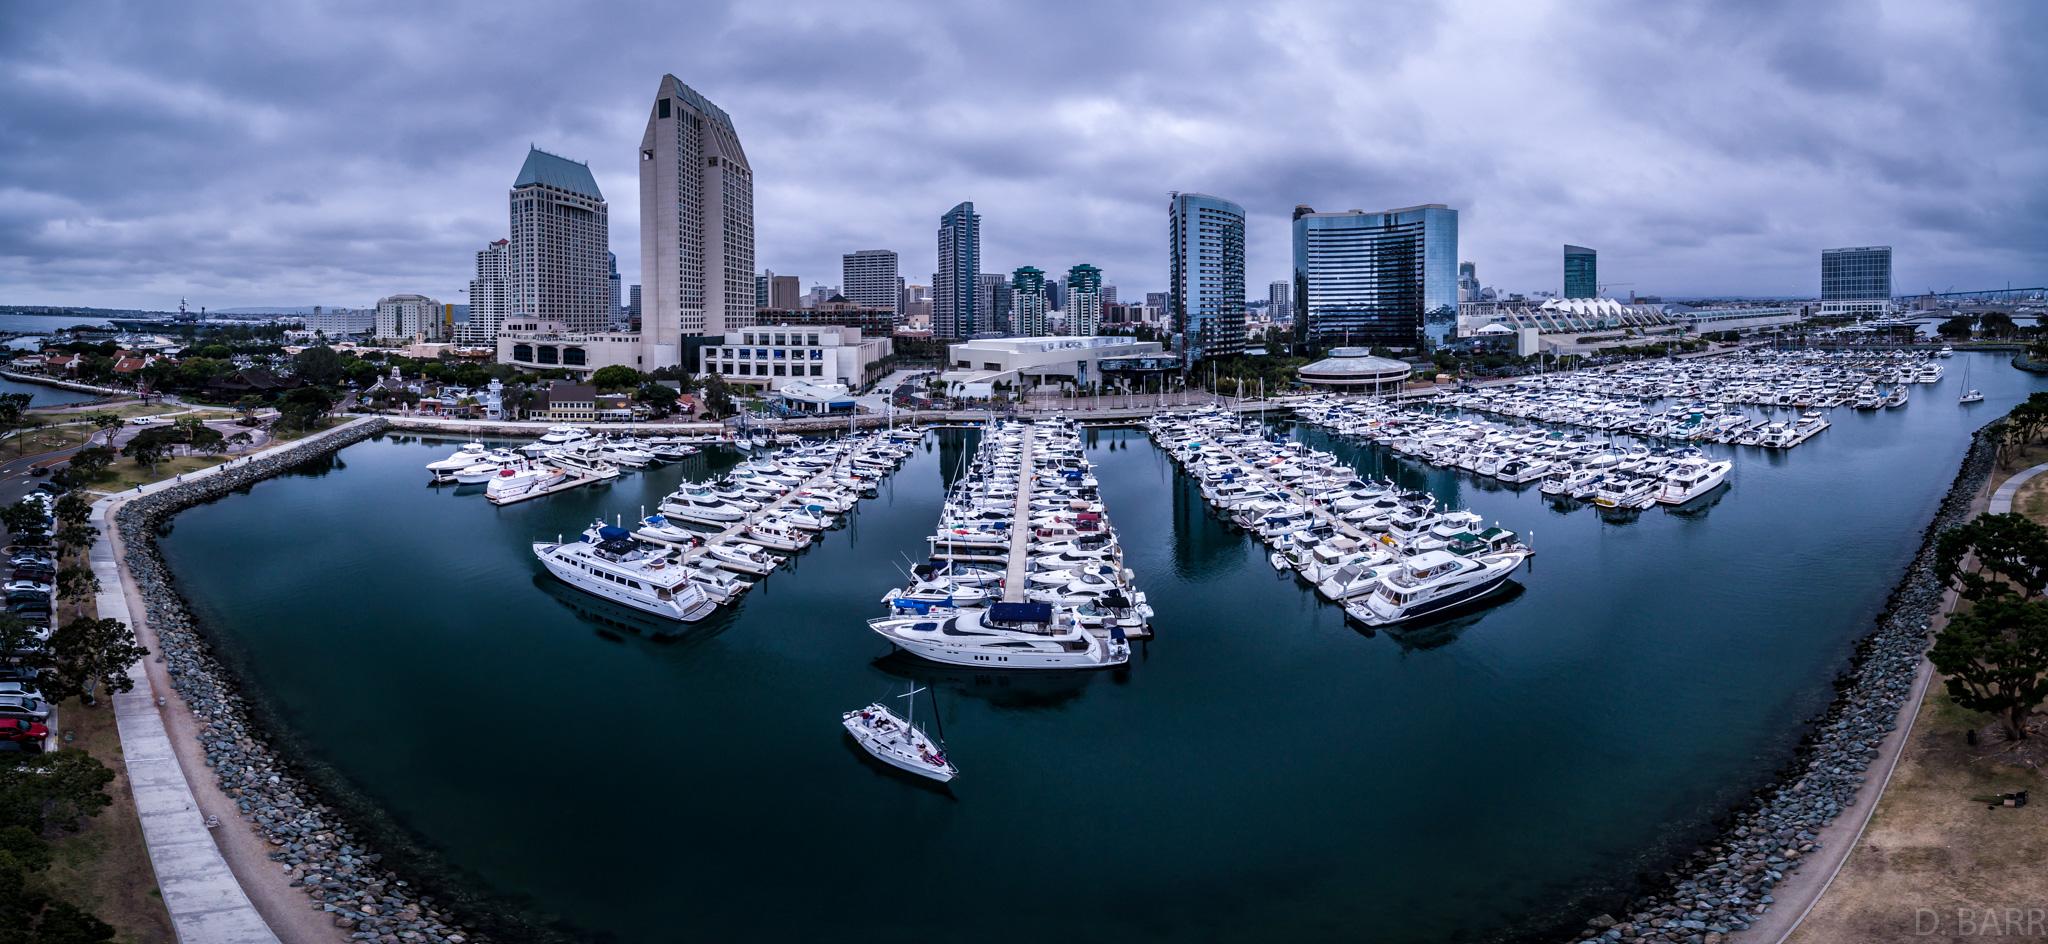 San Diego Bay (Pano shot)